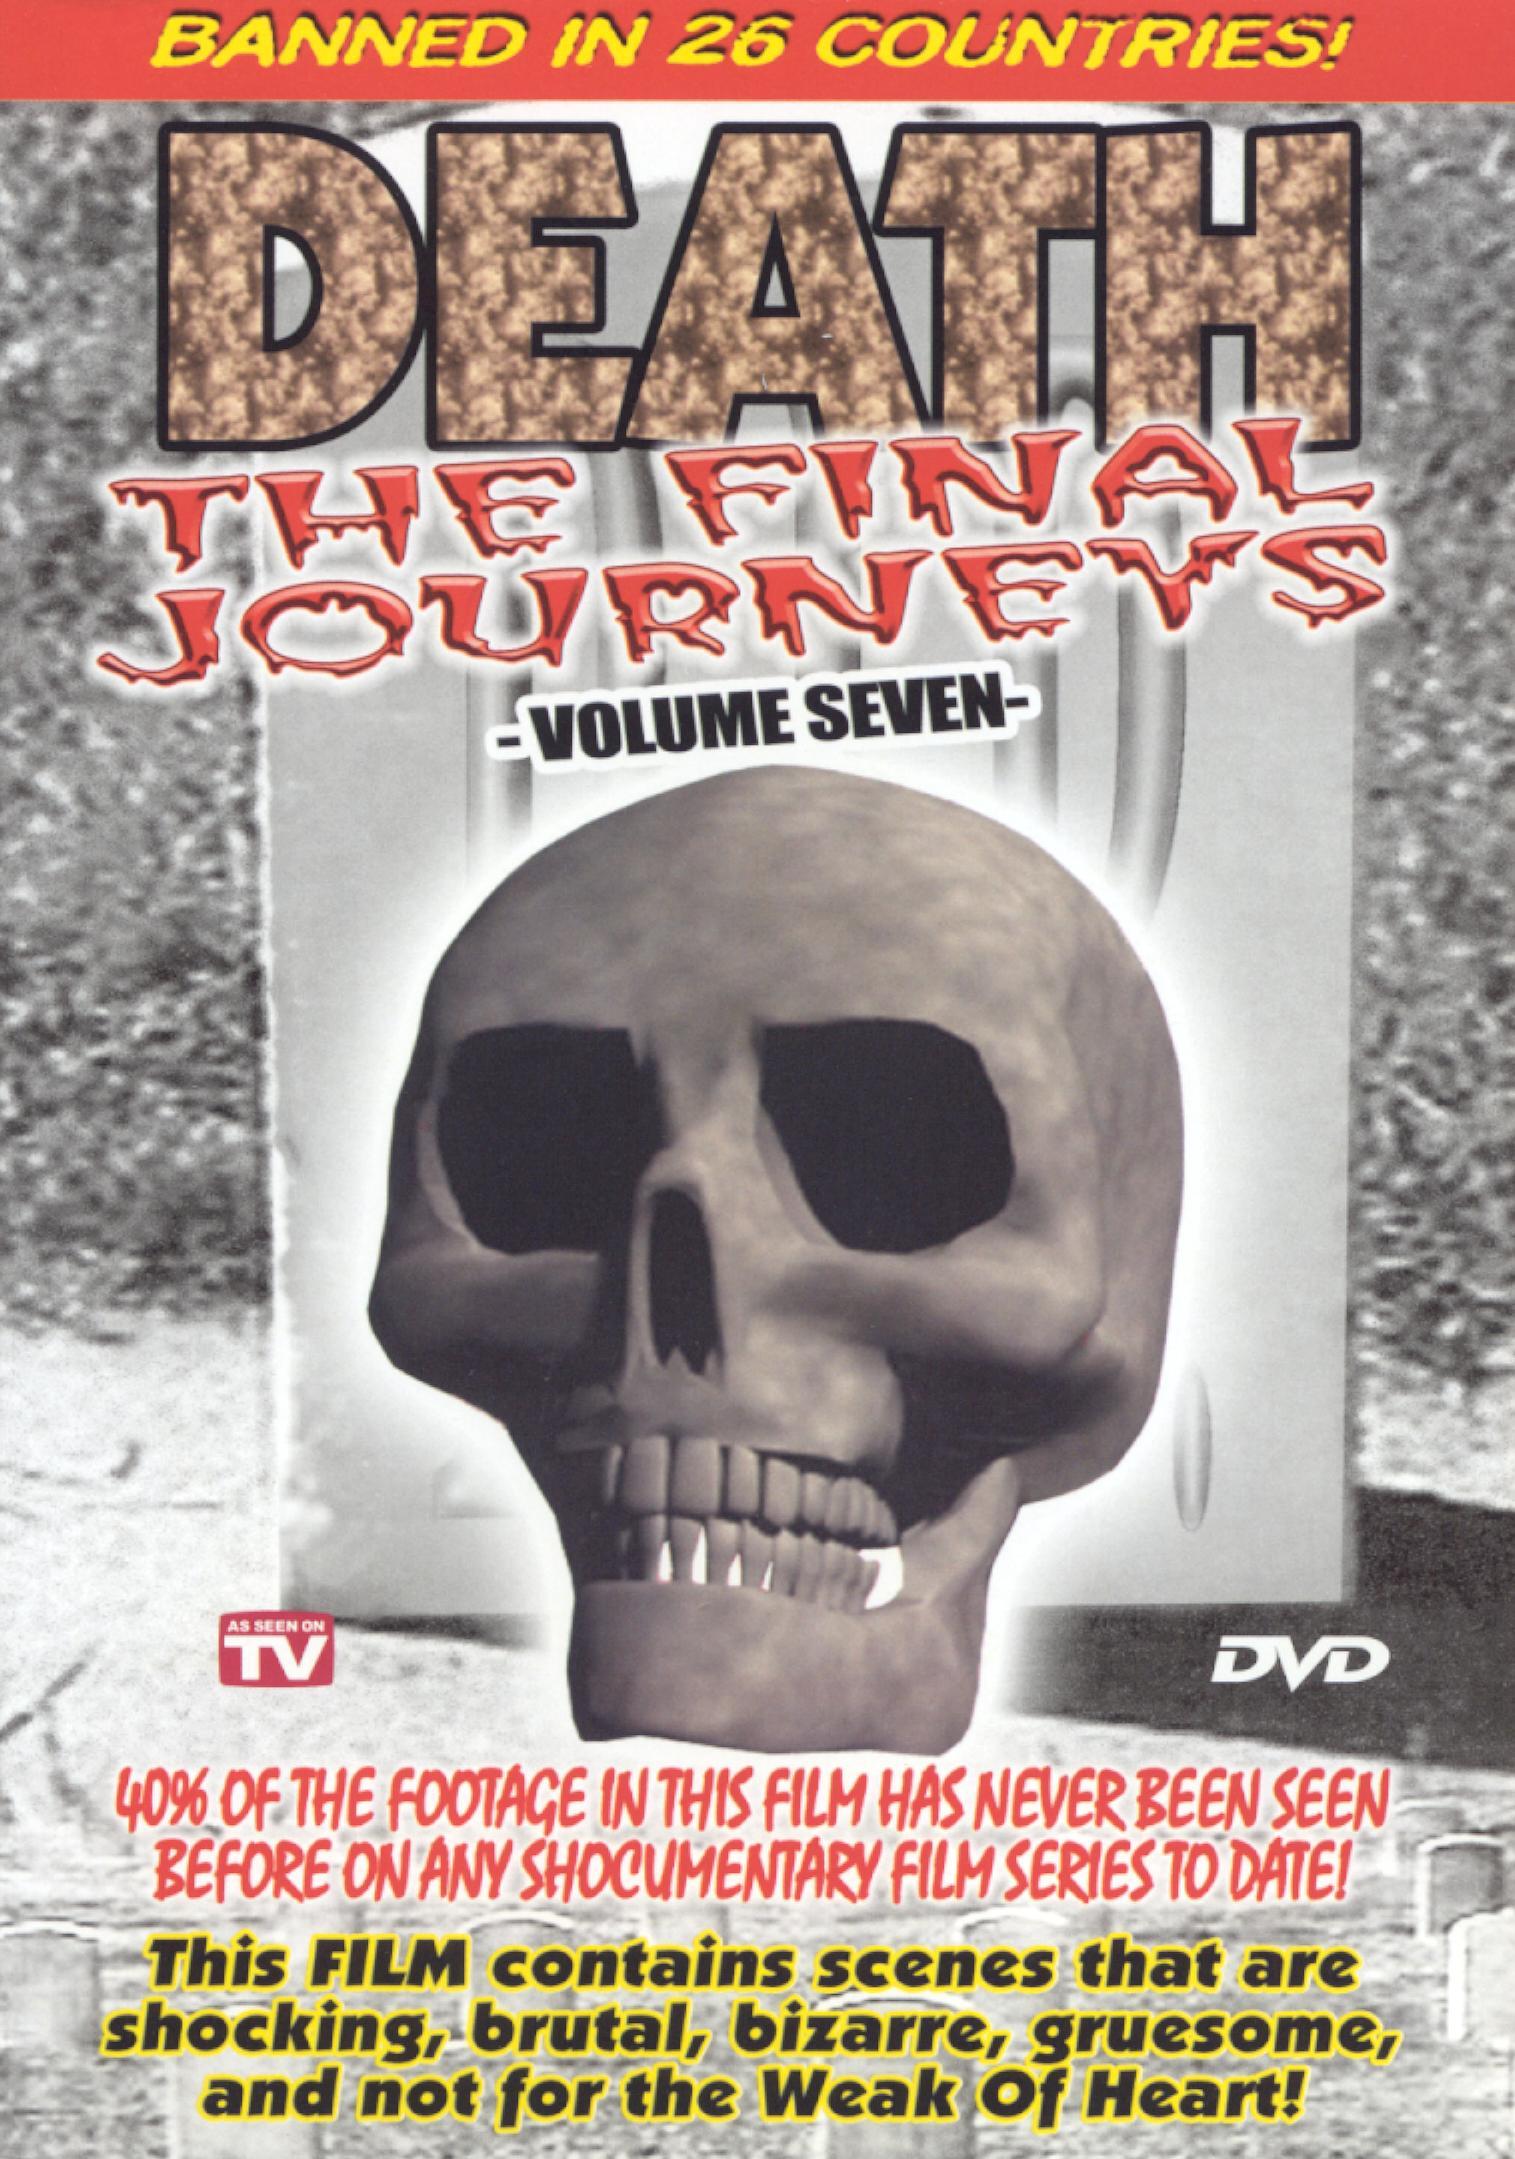 Death: The Final Journey, Vol. 7